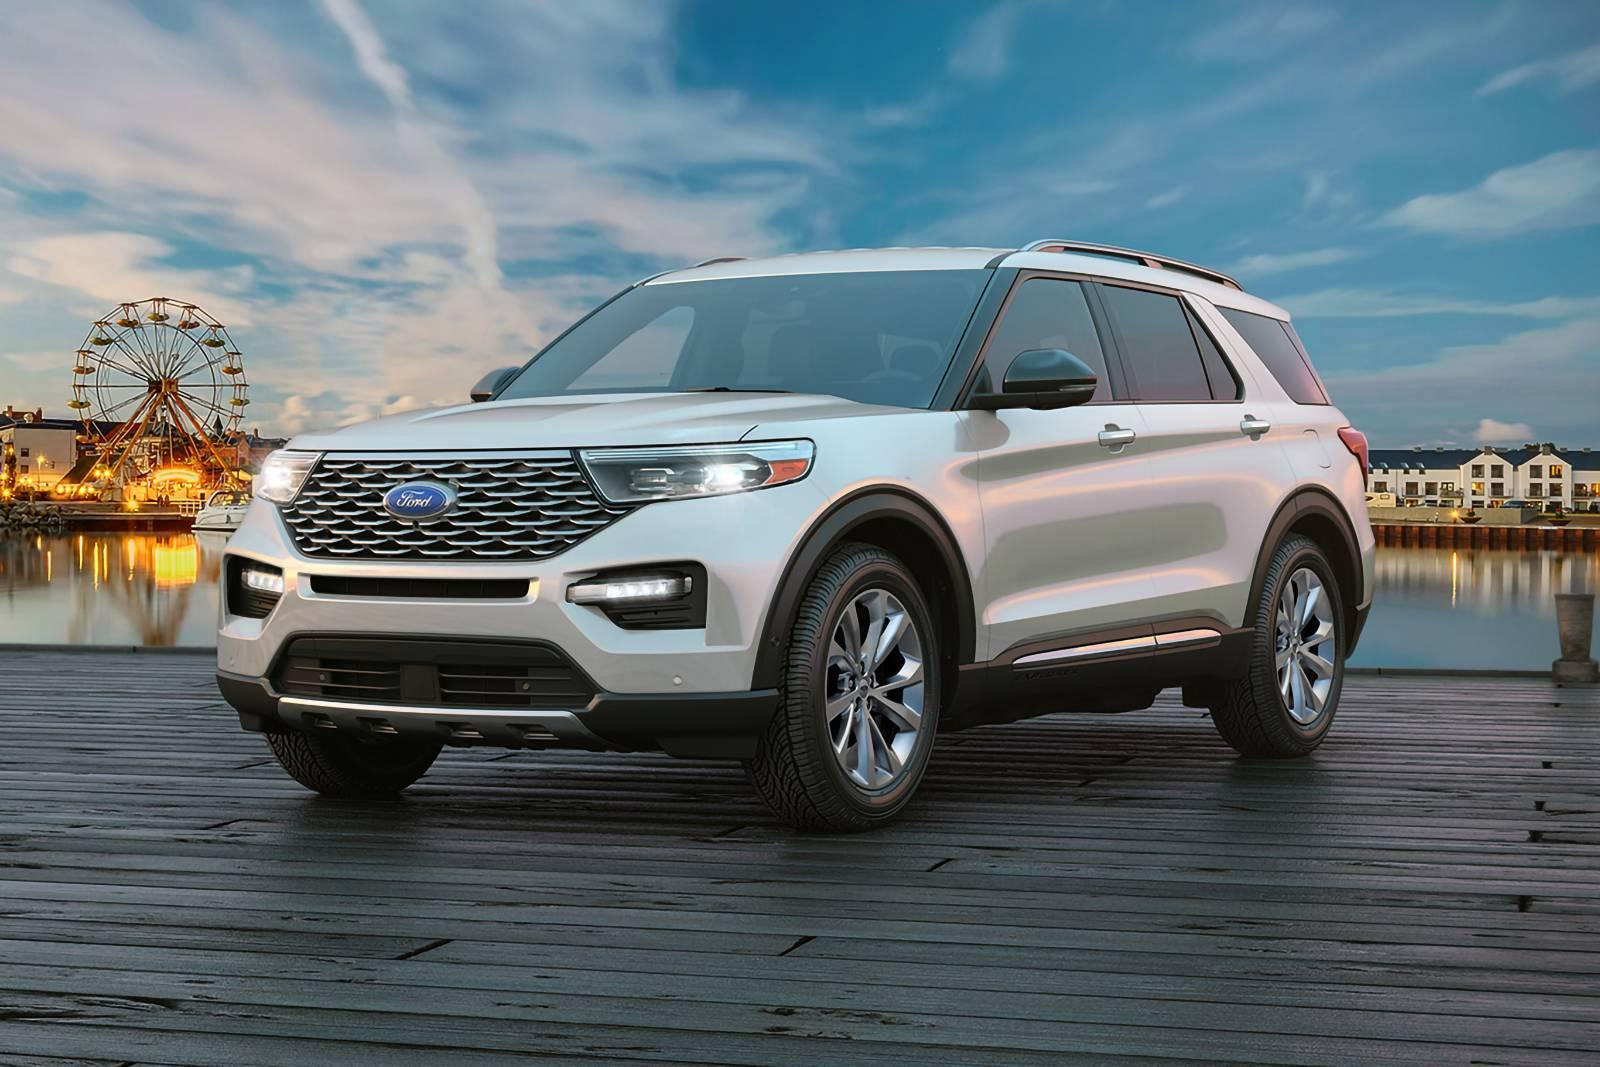 Ford 2021 Explorer image